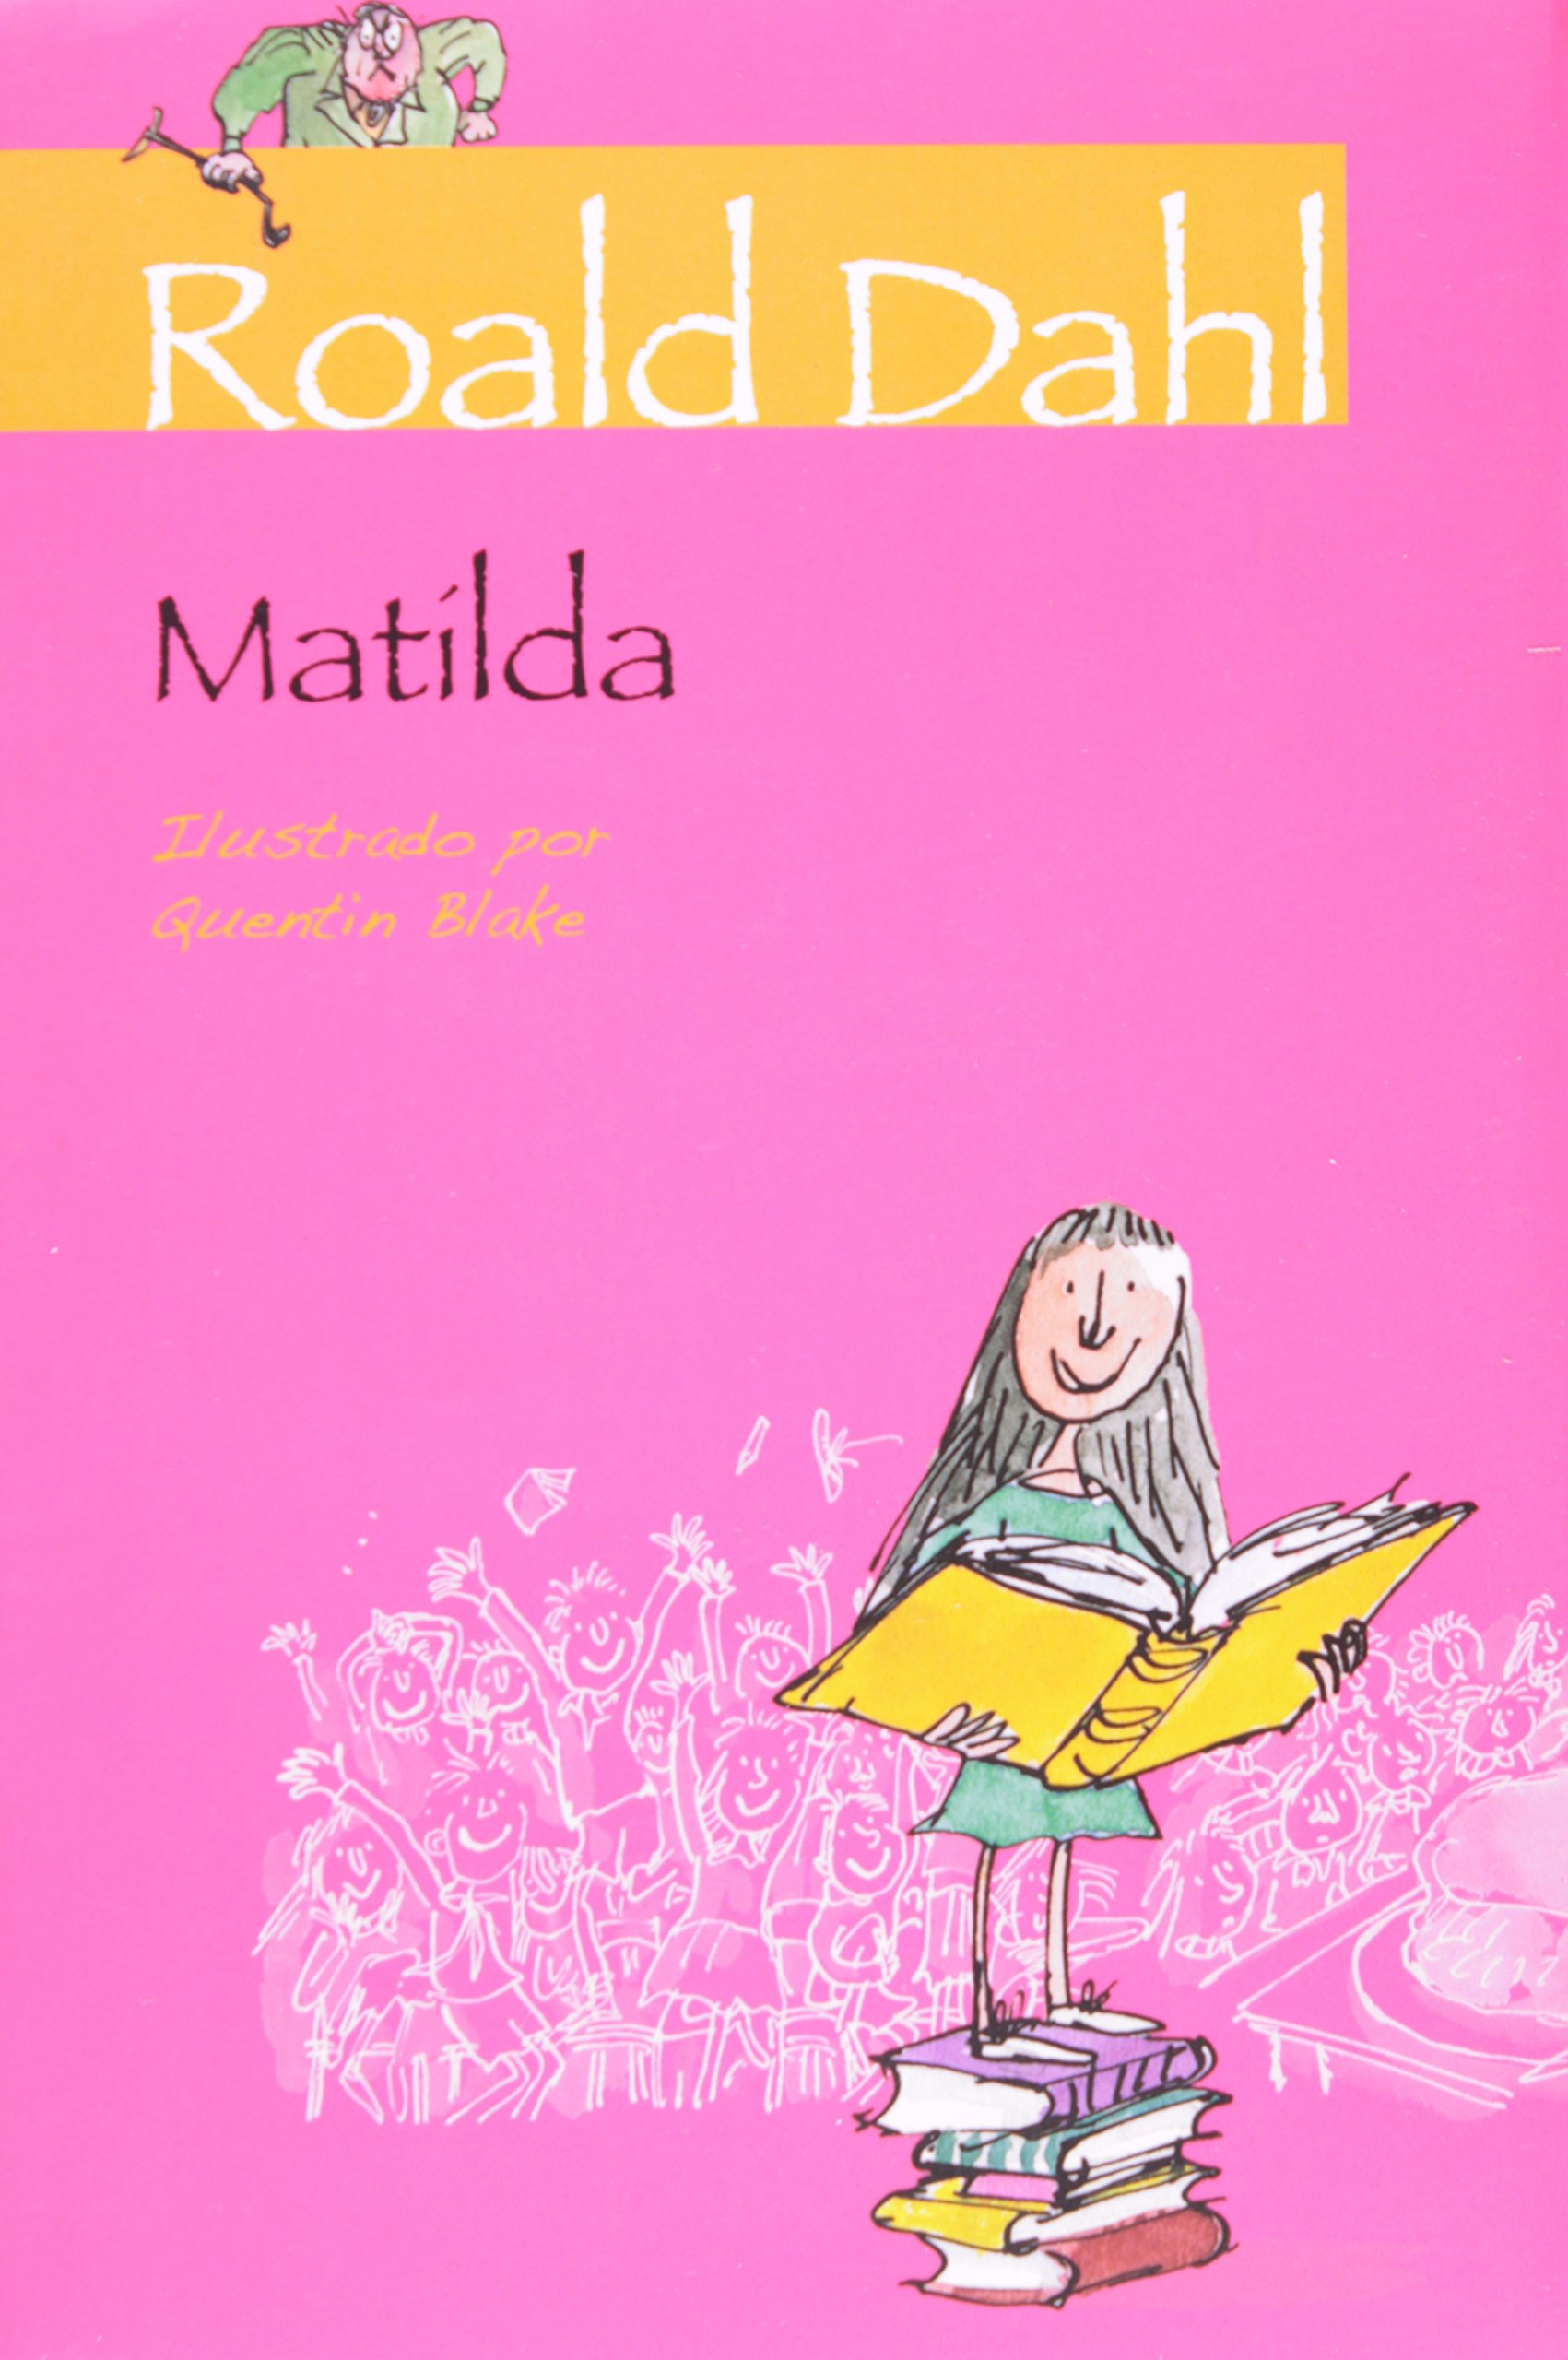 Dahl Matilda Musical